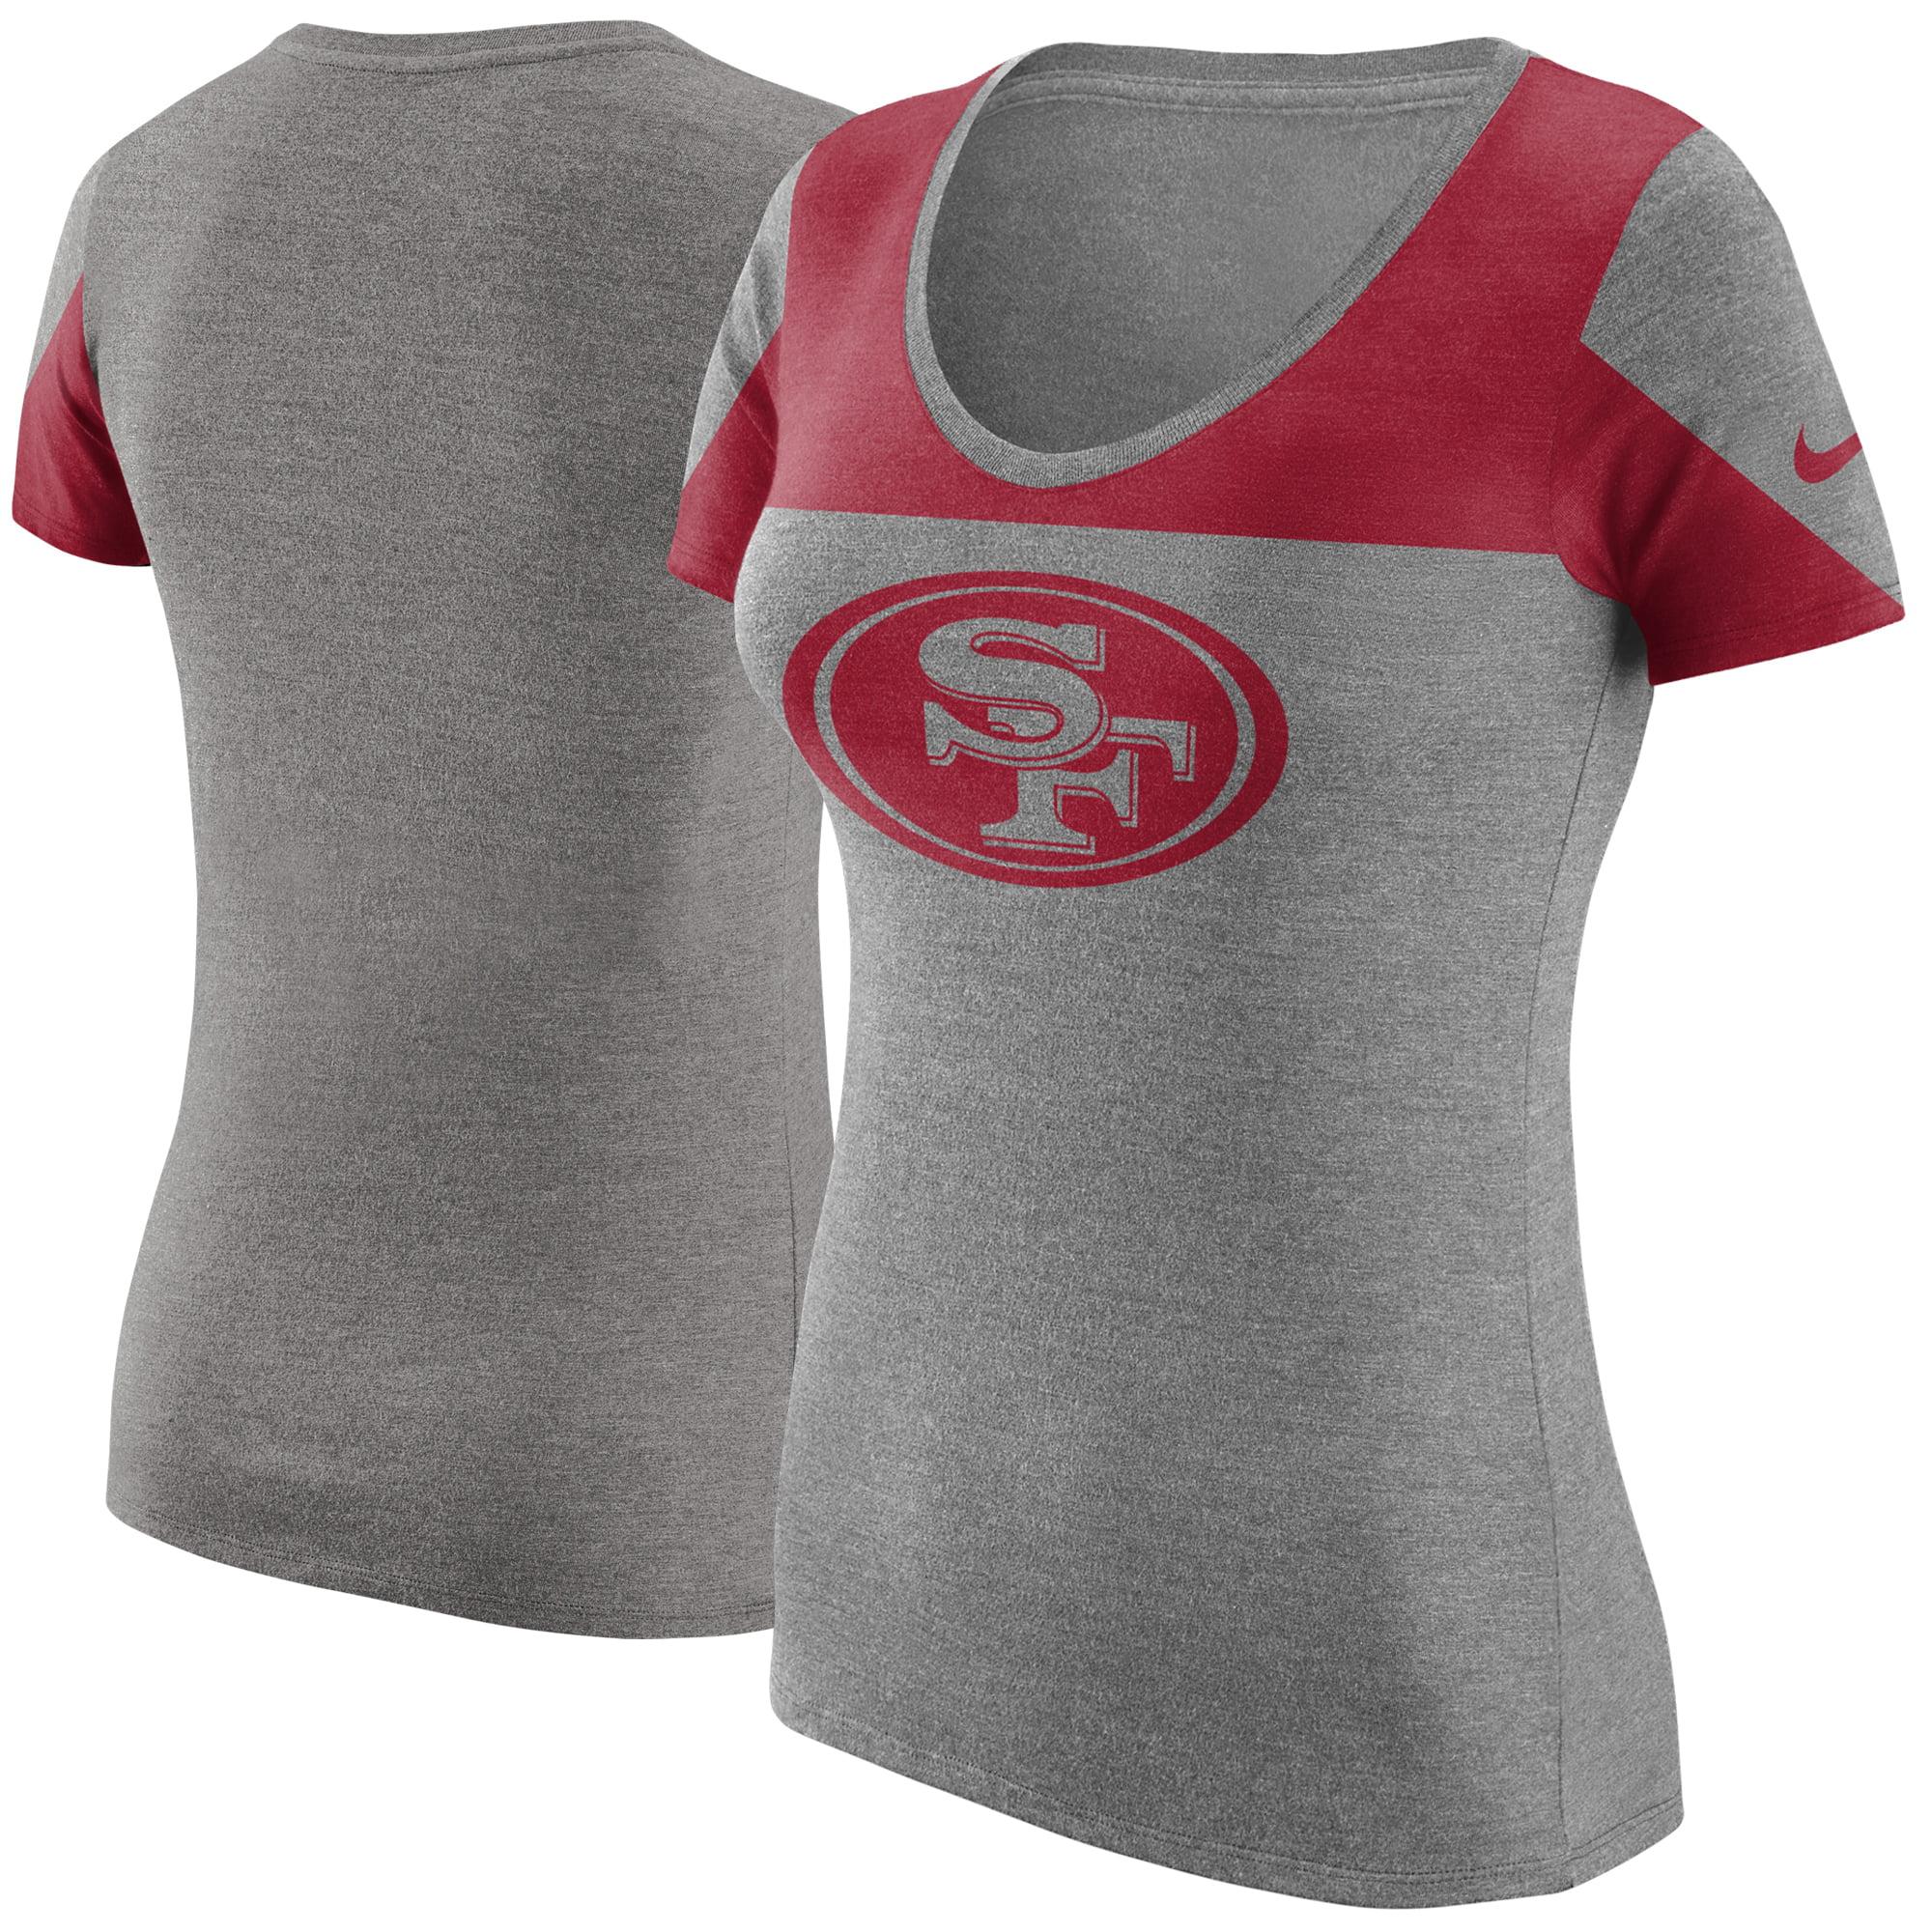 San Francisco 49ers Nike Women's Champ Drive 2 Tri-Blend T-Shirt - Heathered Gray